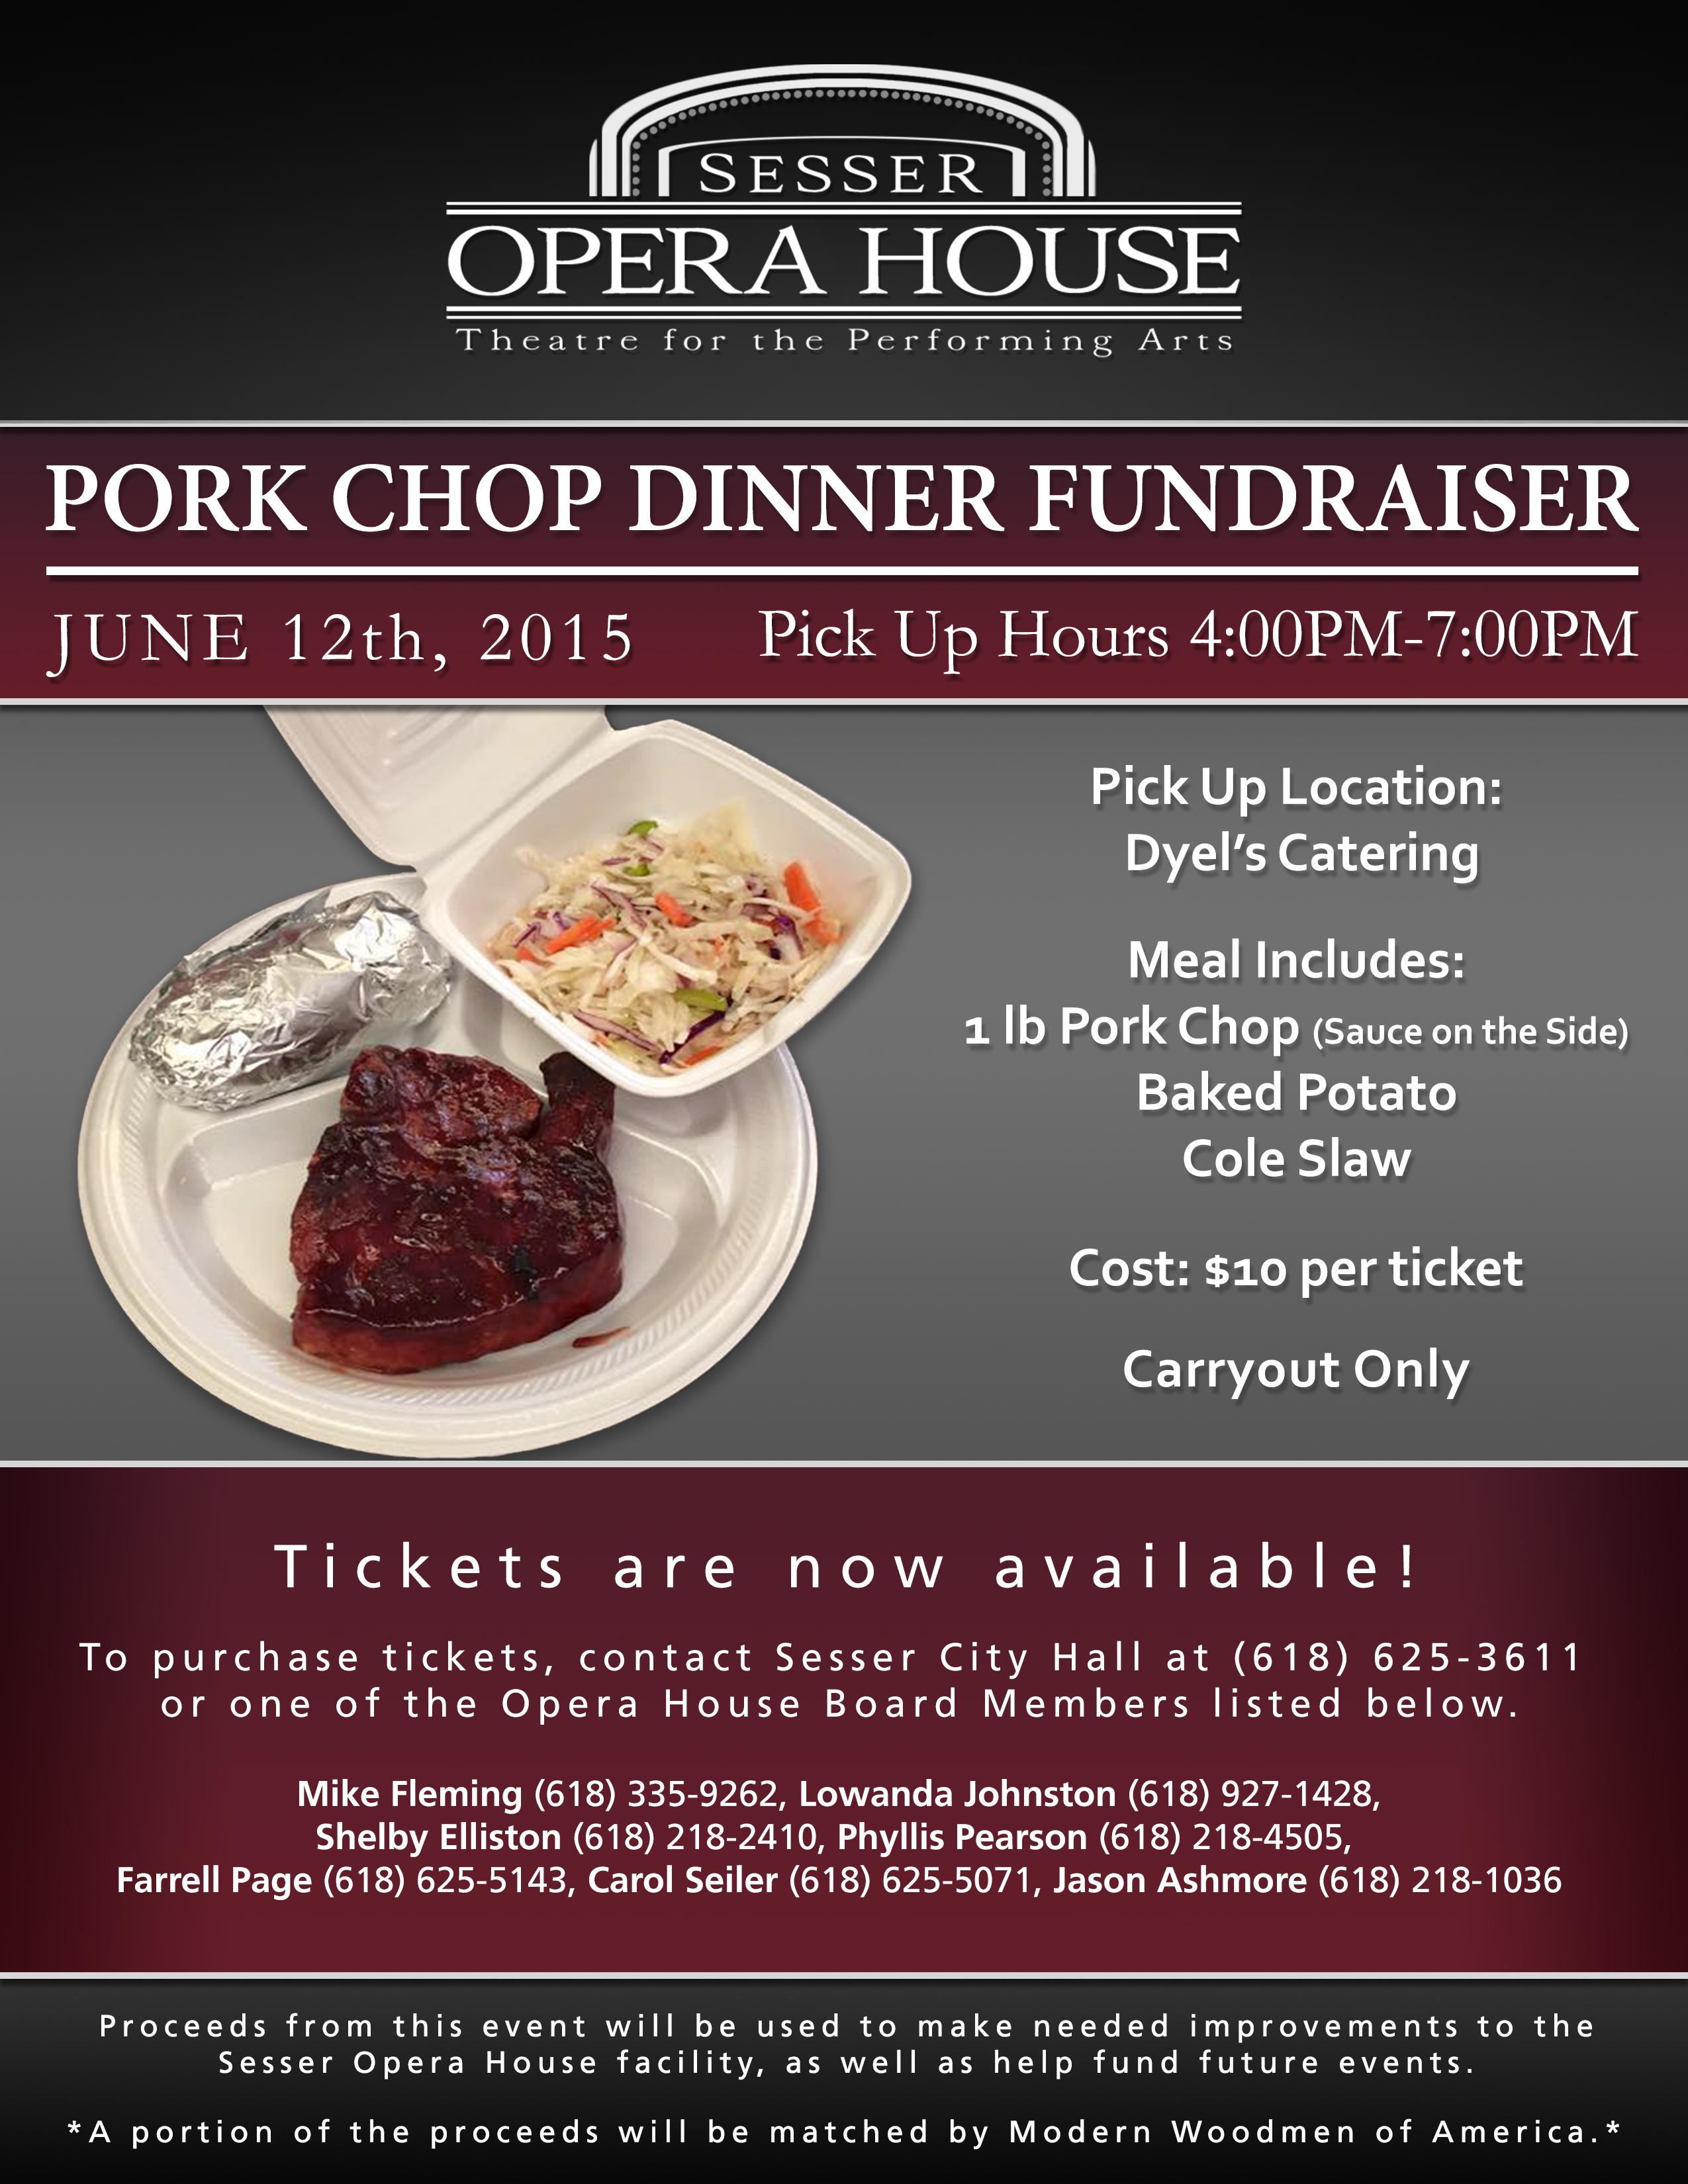 Porkchop Dinner Fundraiser Flyer